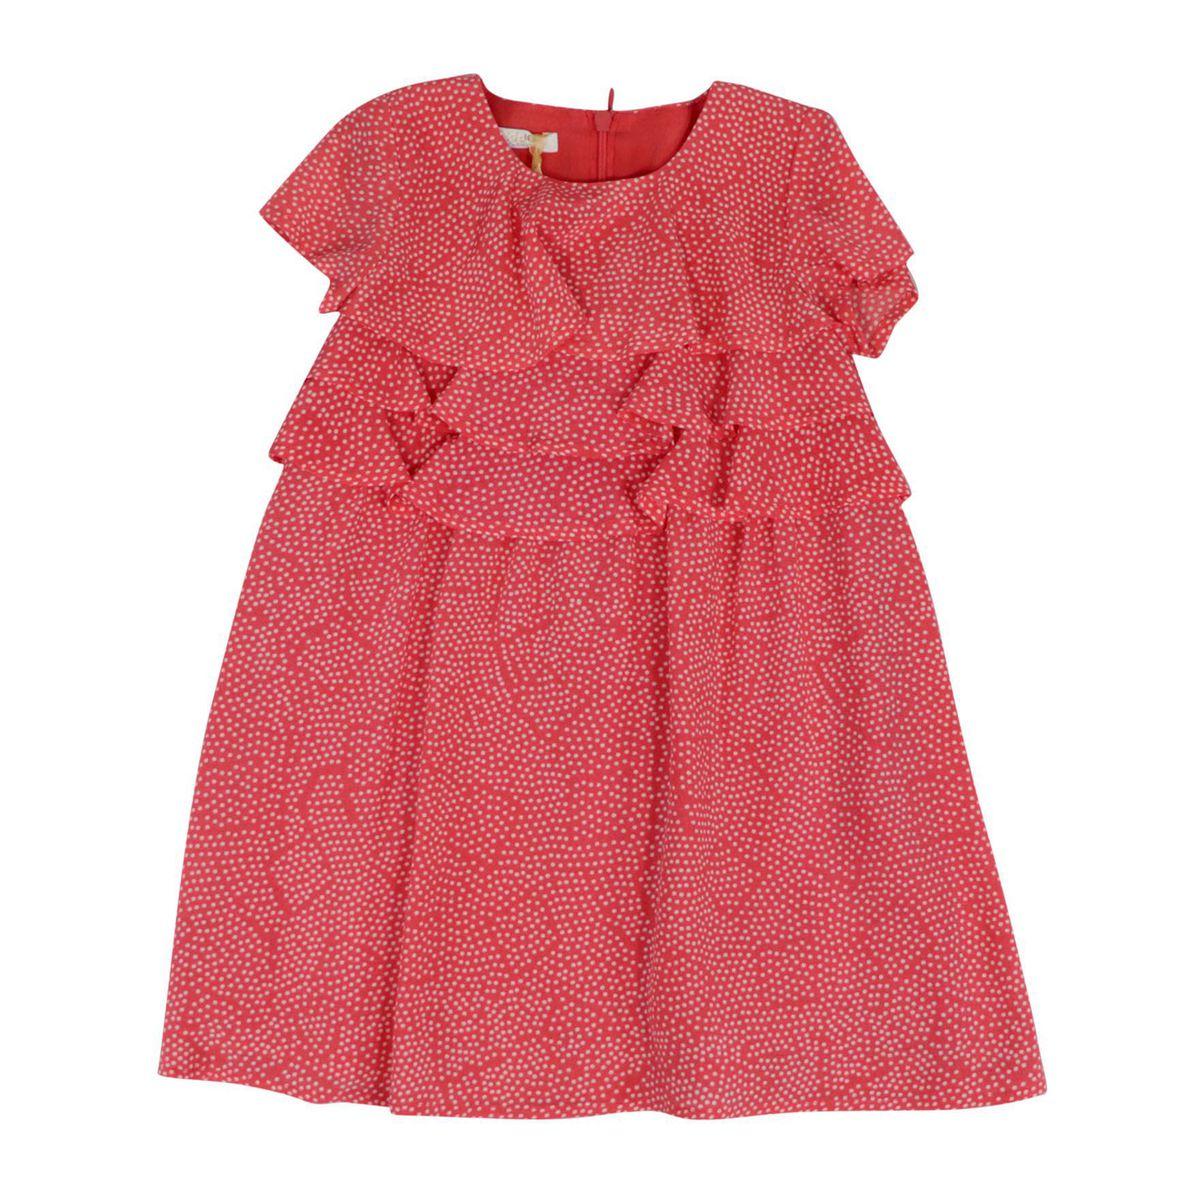 Viscose dress with polka dot print Coral Liu Jo